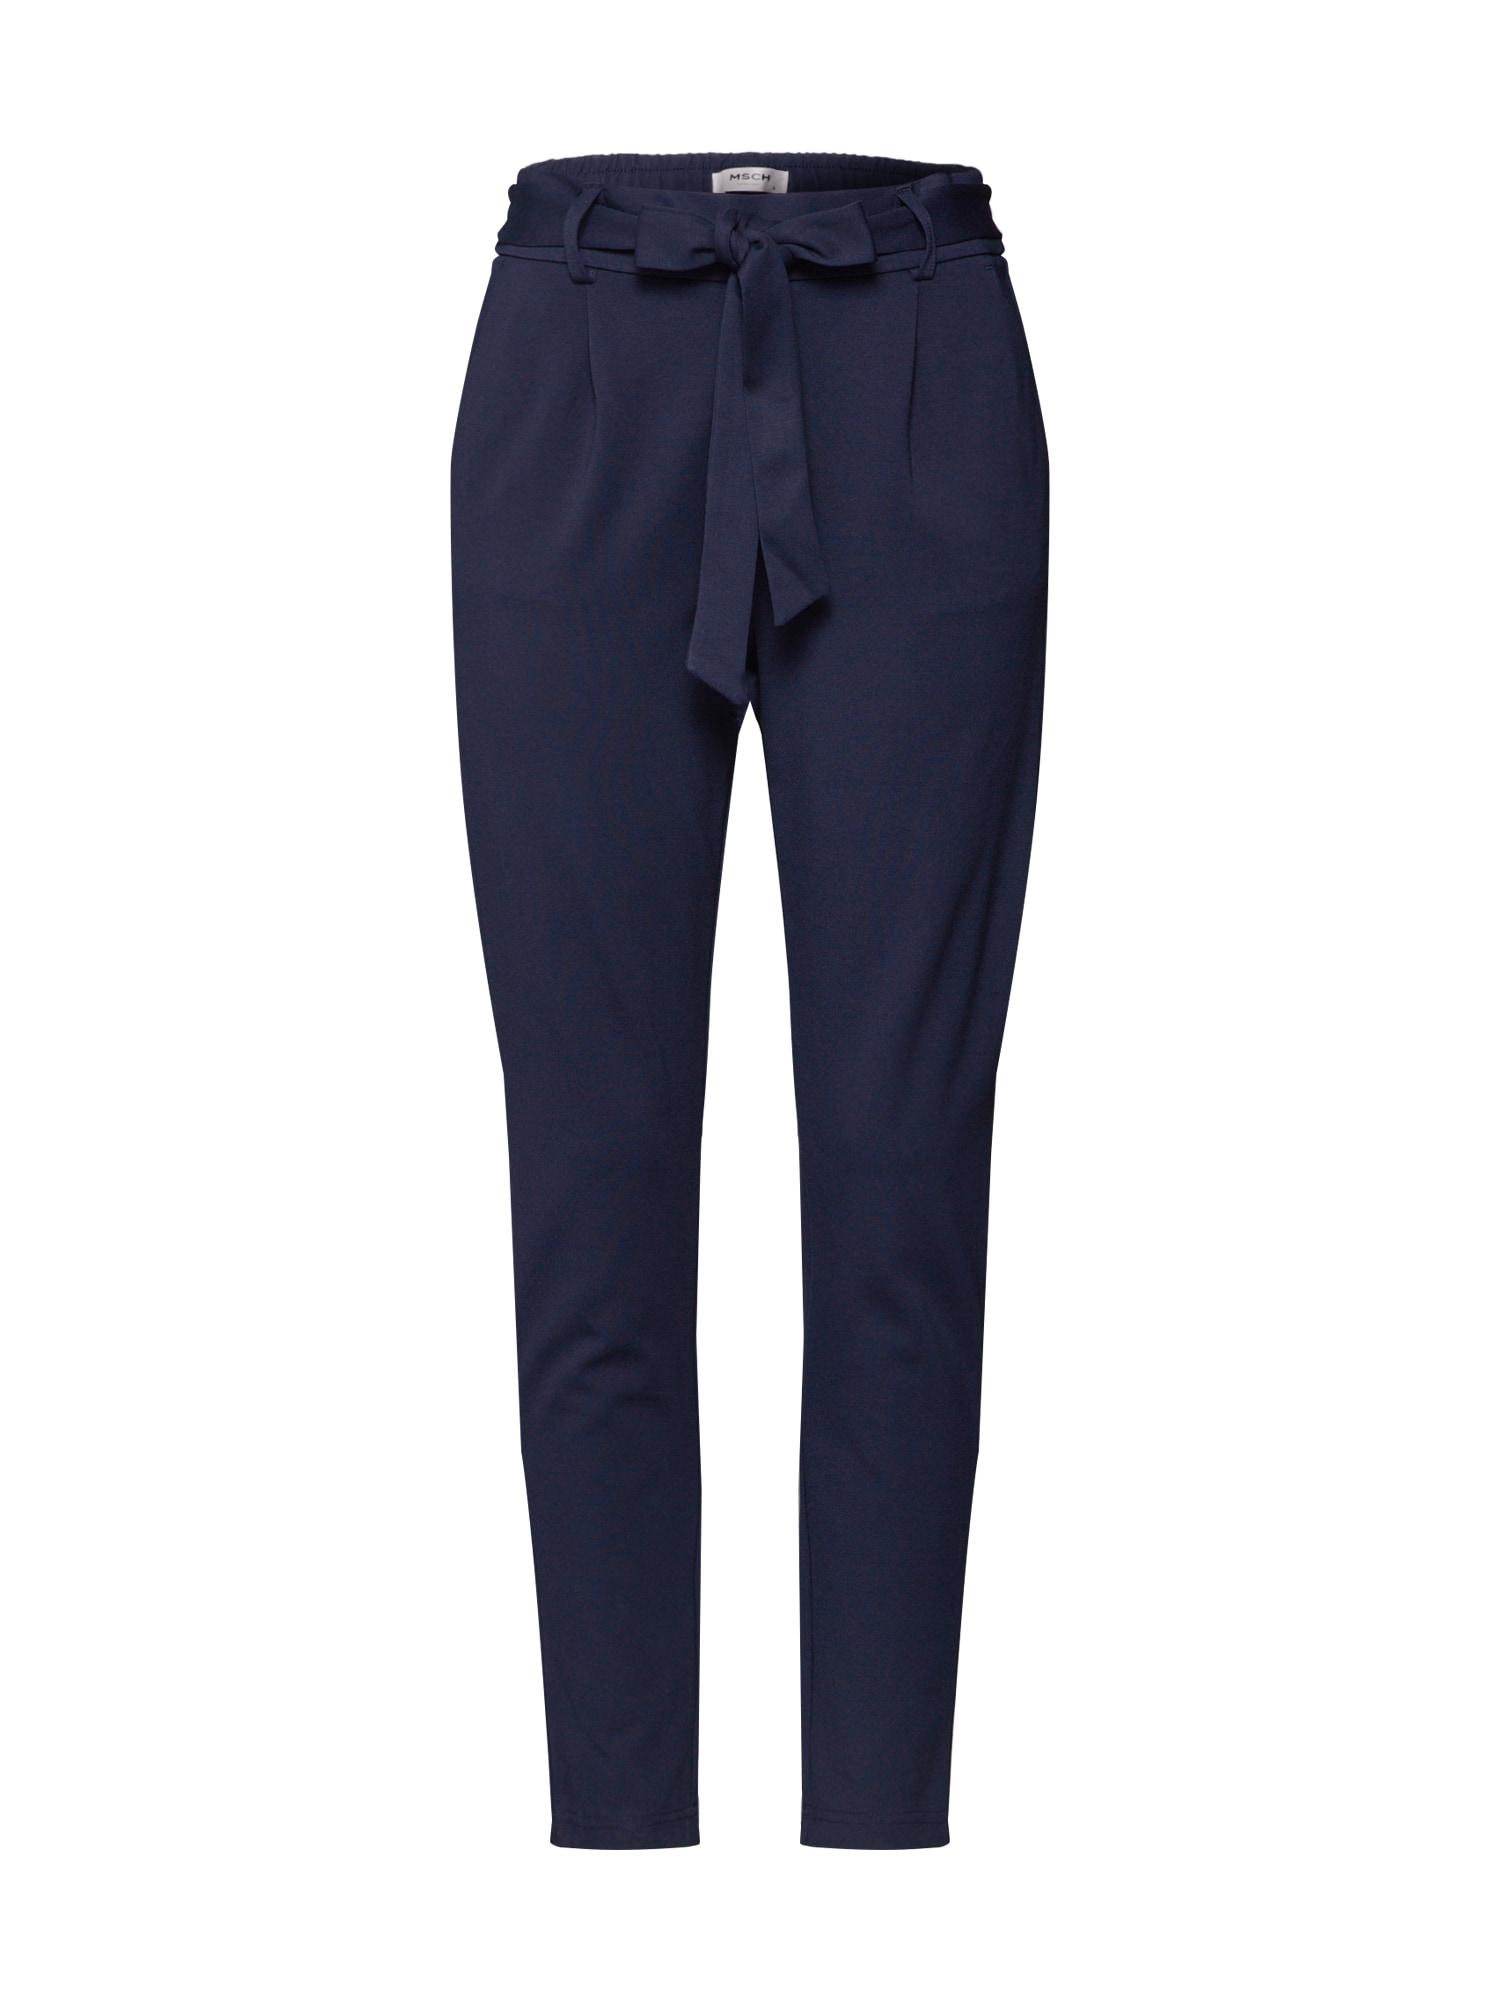 MOSS COPENHAGEN Plisované nohavice 'Popye'  modré